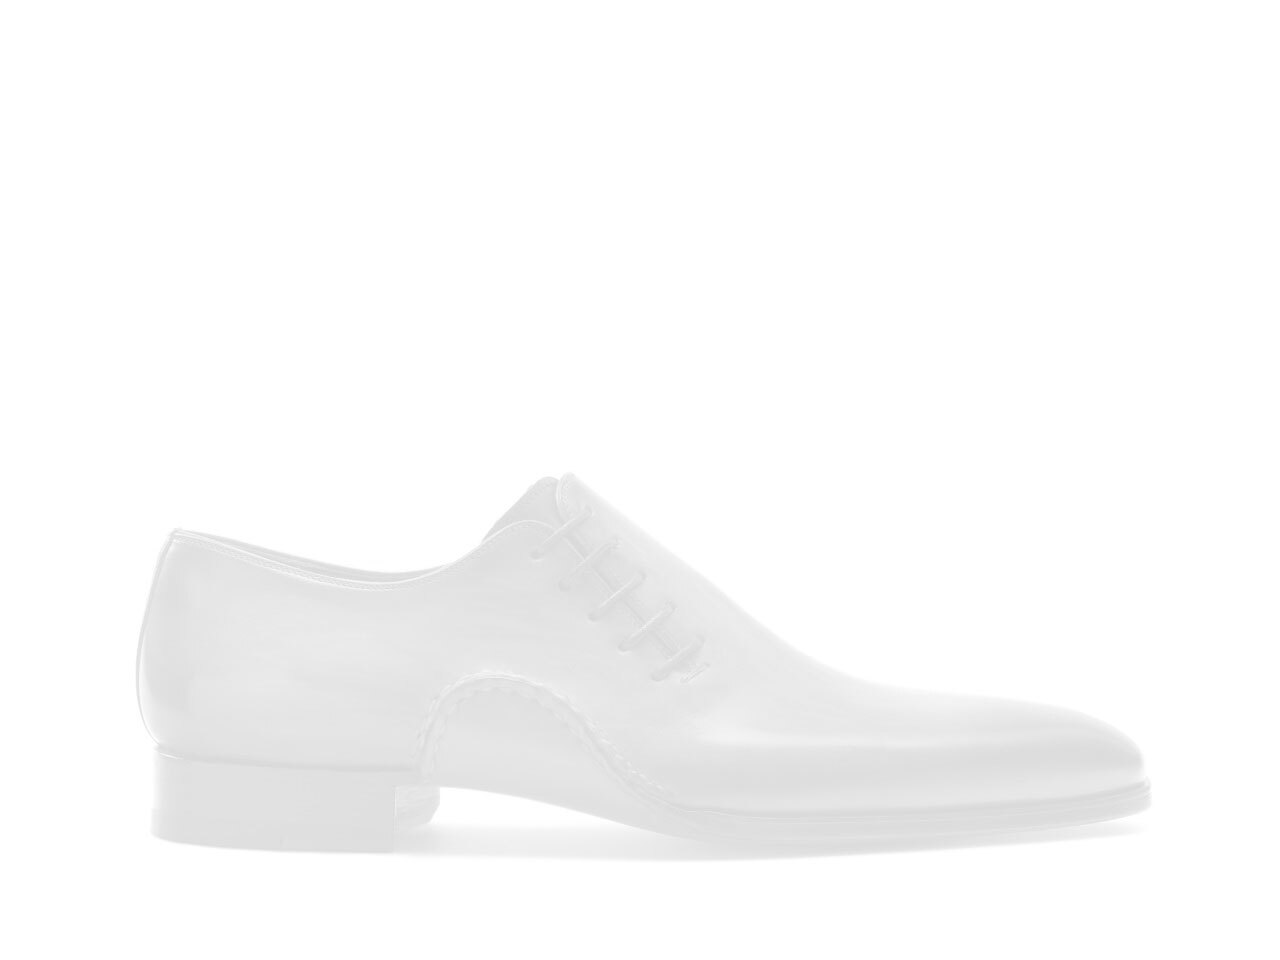 Sole of the Magnanni Óscar Black Men's Oxford Shoes